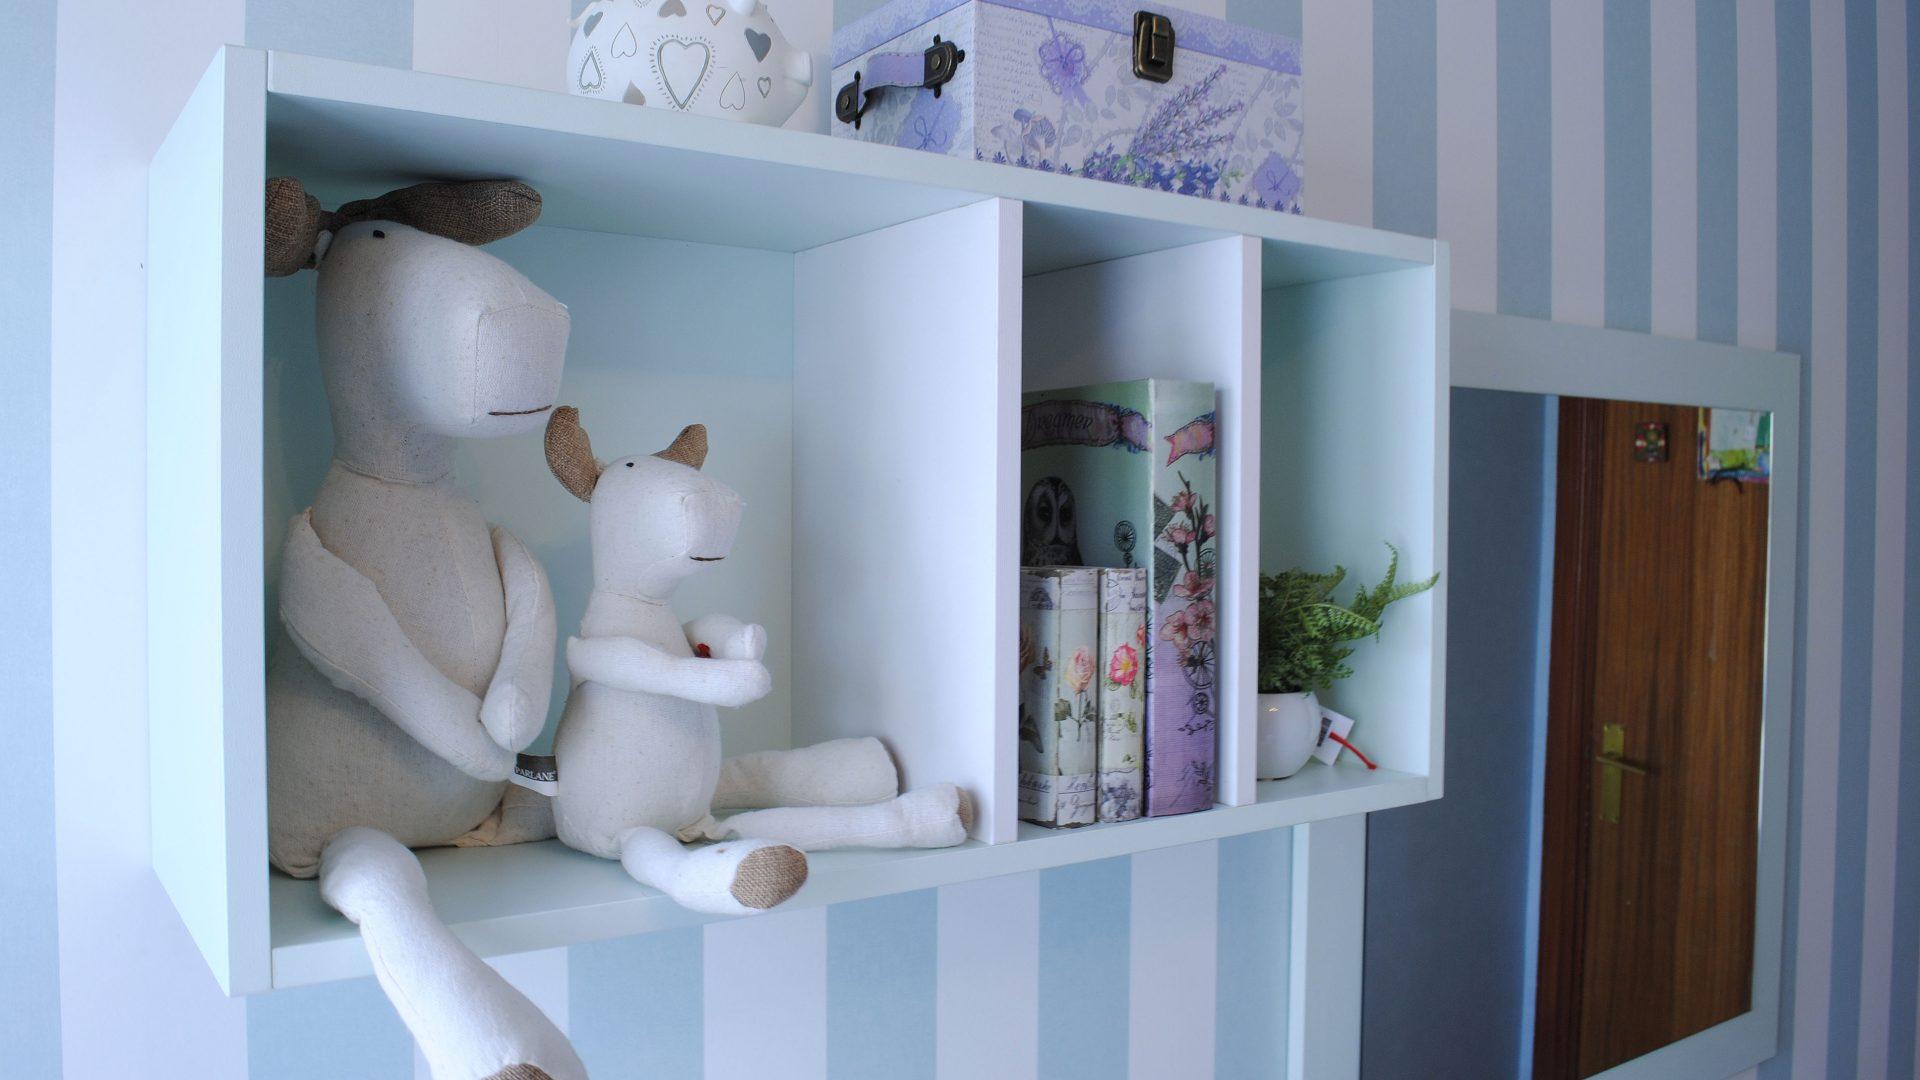 mugarri_decoracion_salita_dormitorio_estilismo_azul_bizkaia_01